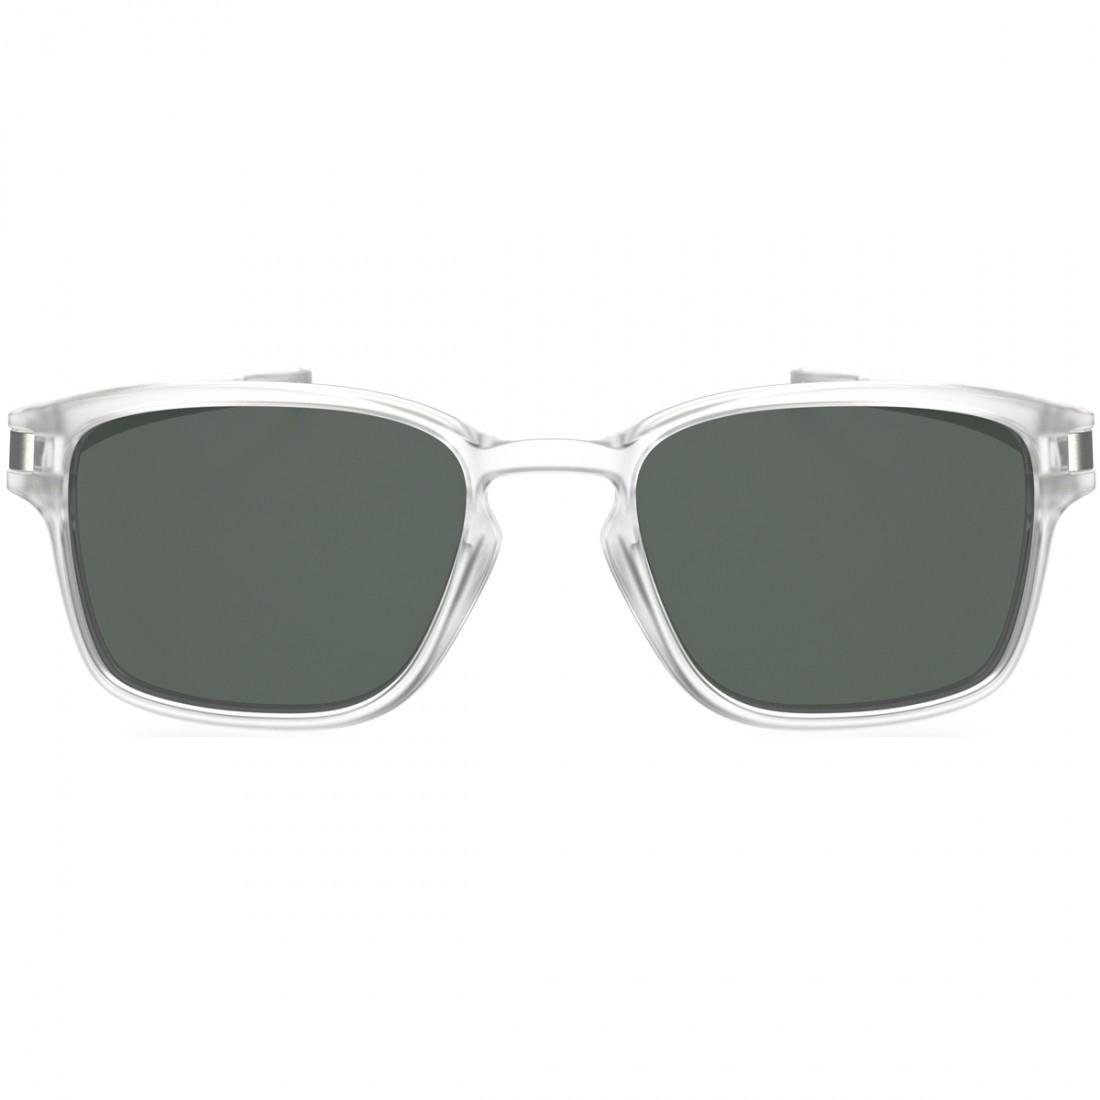 223f3472f4 Óculos de sol OAKLEY Latch Square Matte Clear / Dark Grey · Motocard